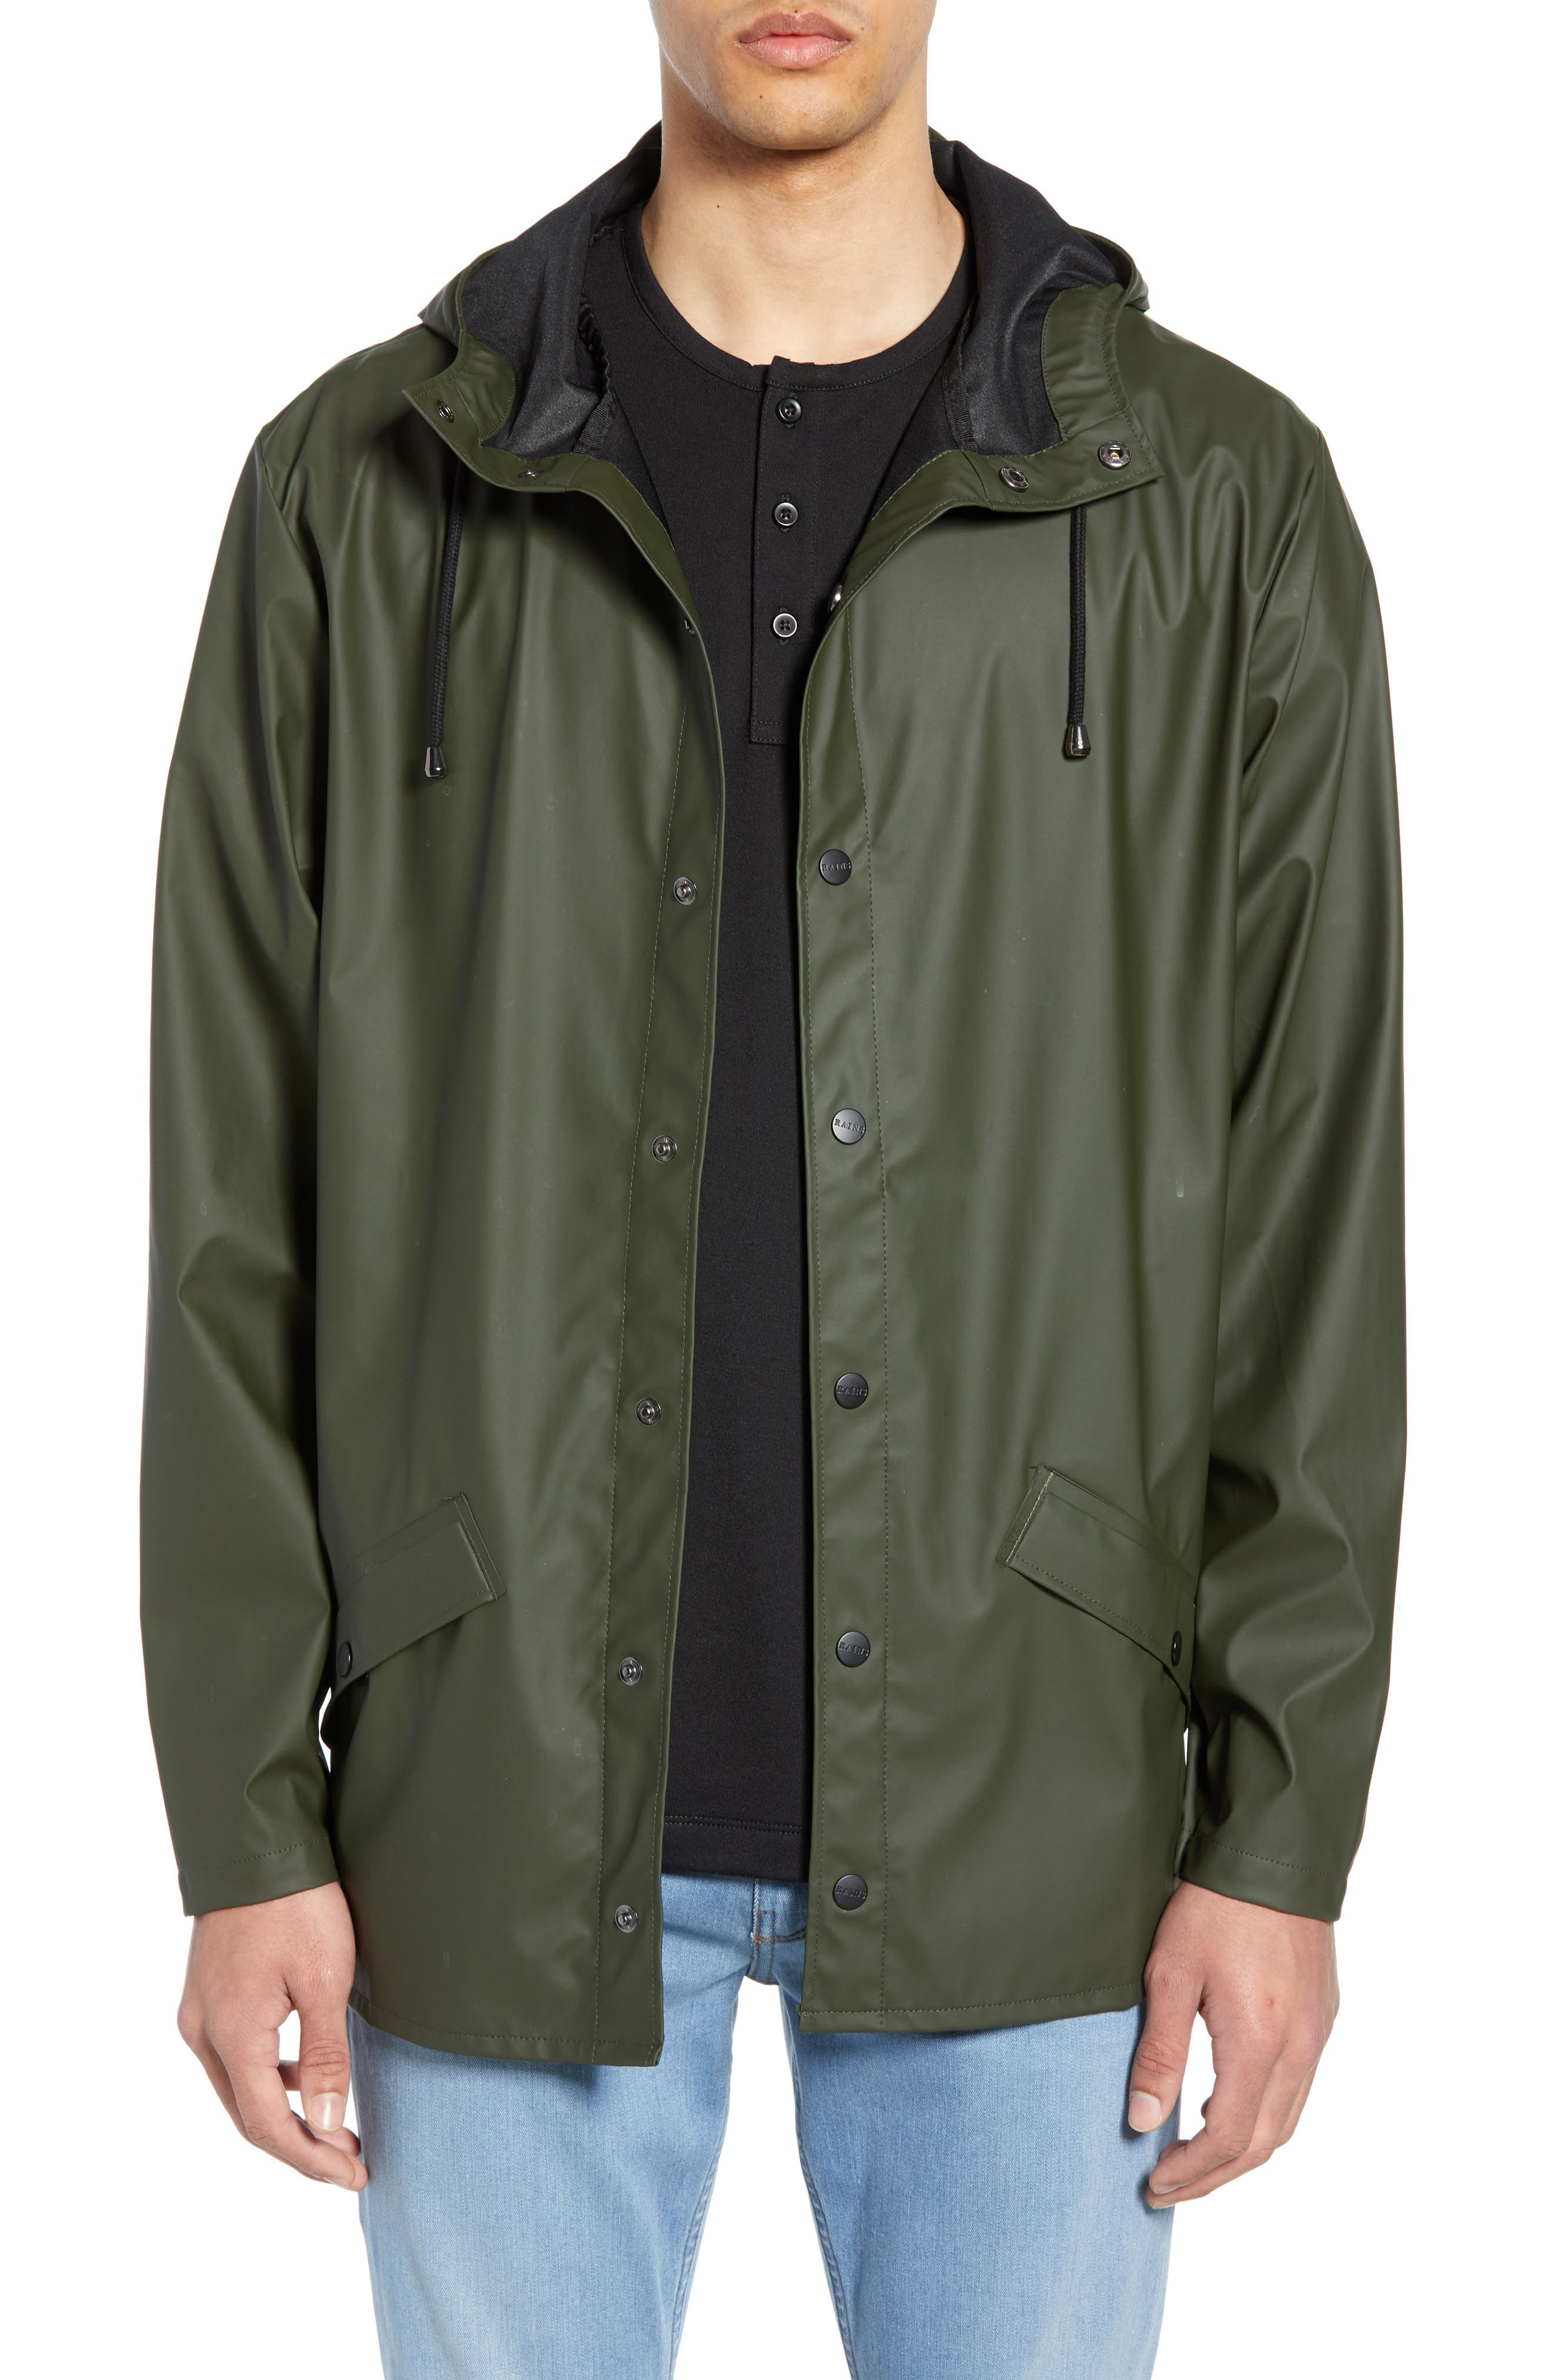 Rains Lightweight Hooded Rain Jacket, Green